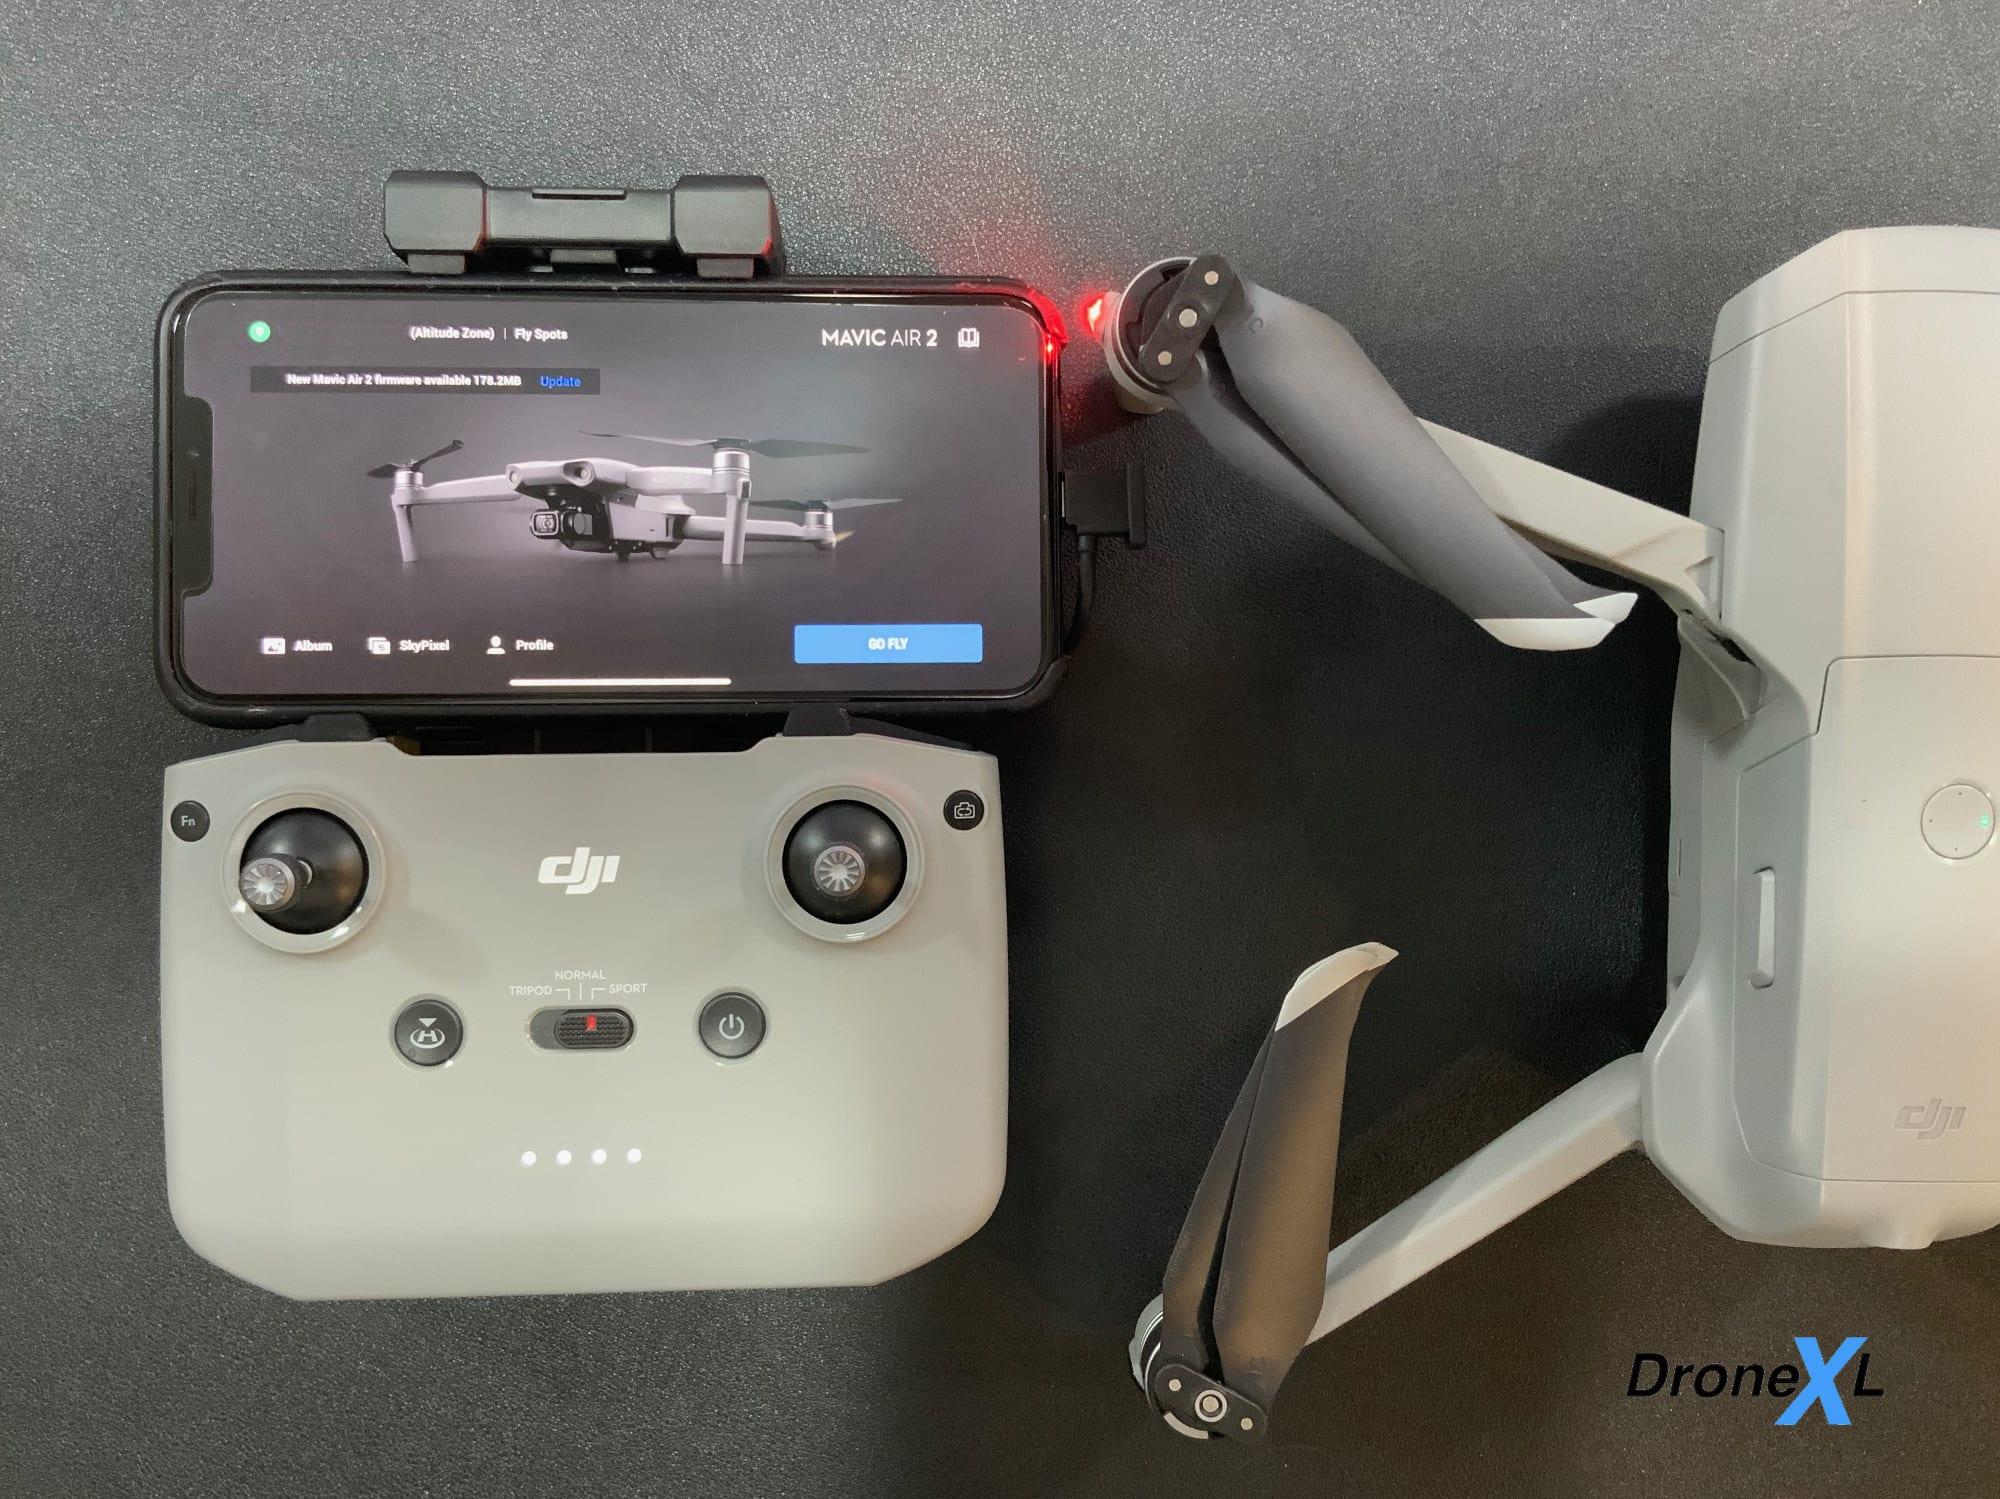 DJI Mavic Air 2 firmware update released - V01.00.0250